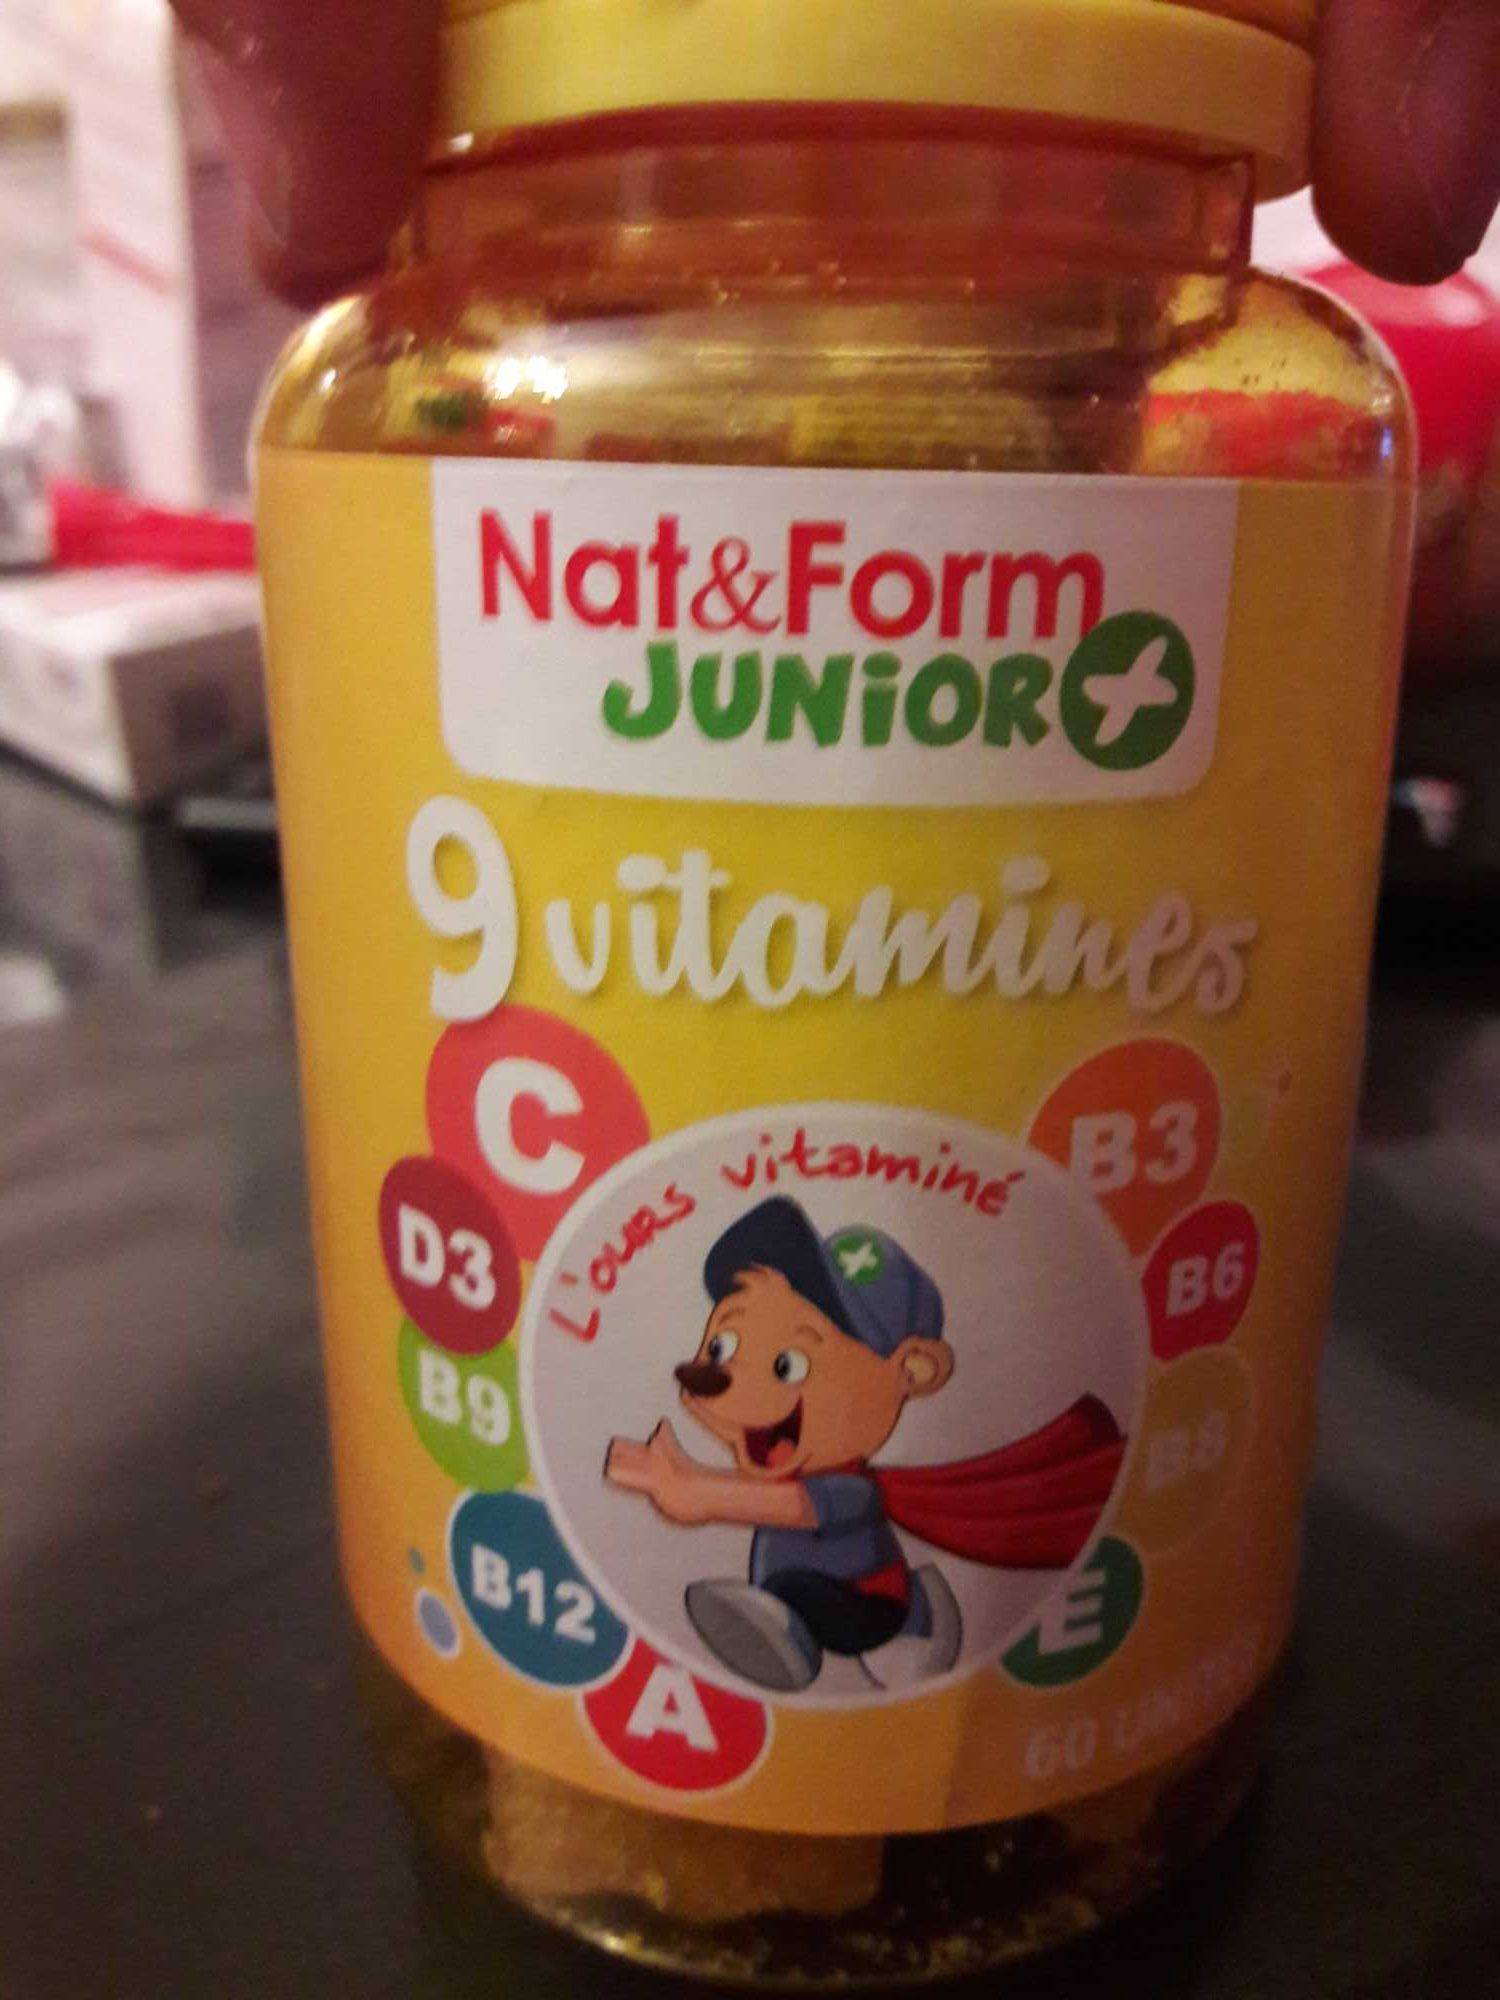 9 Vitamines Goût orange, citron, framboise - Prodotto - fr